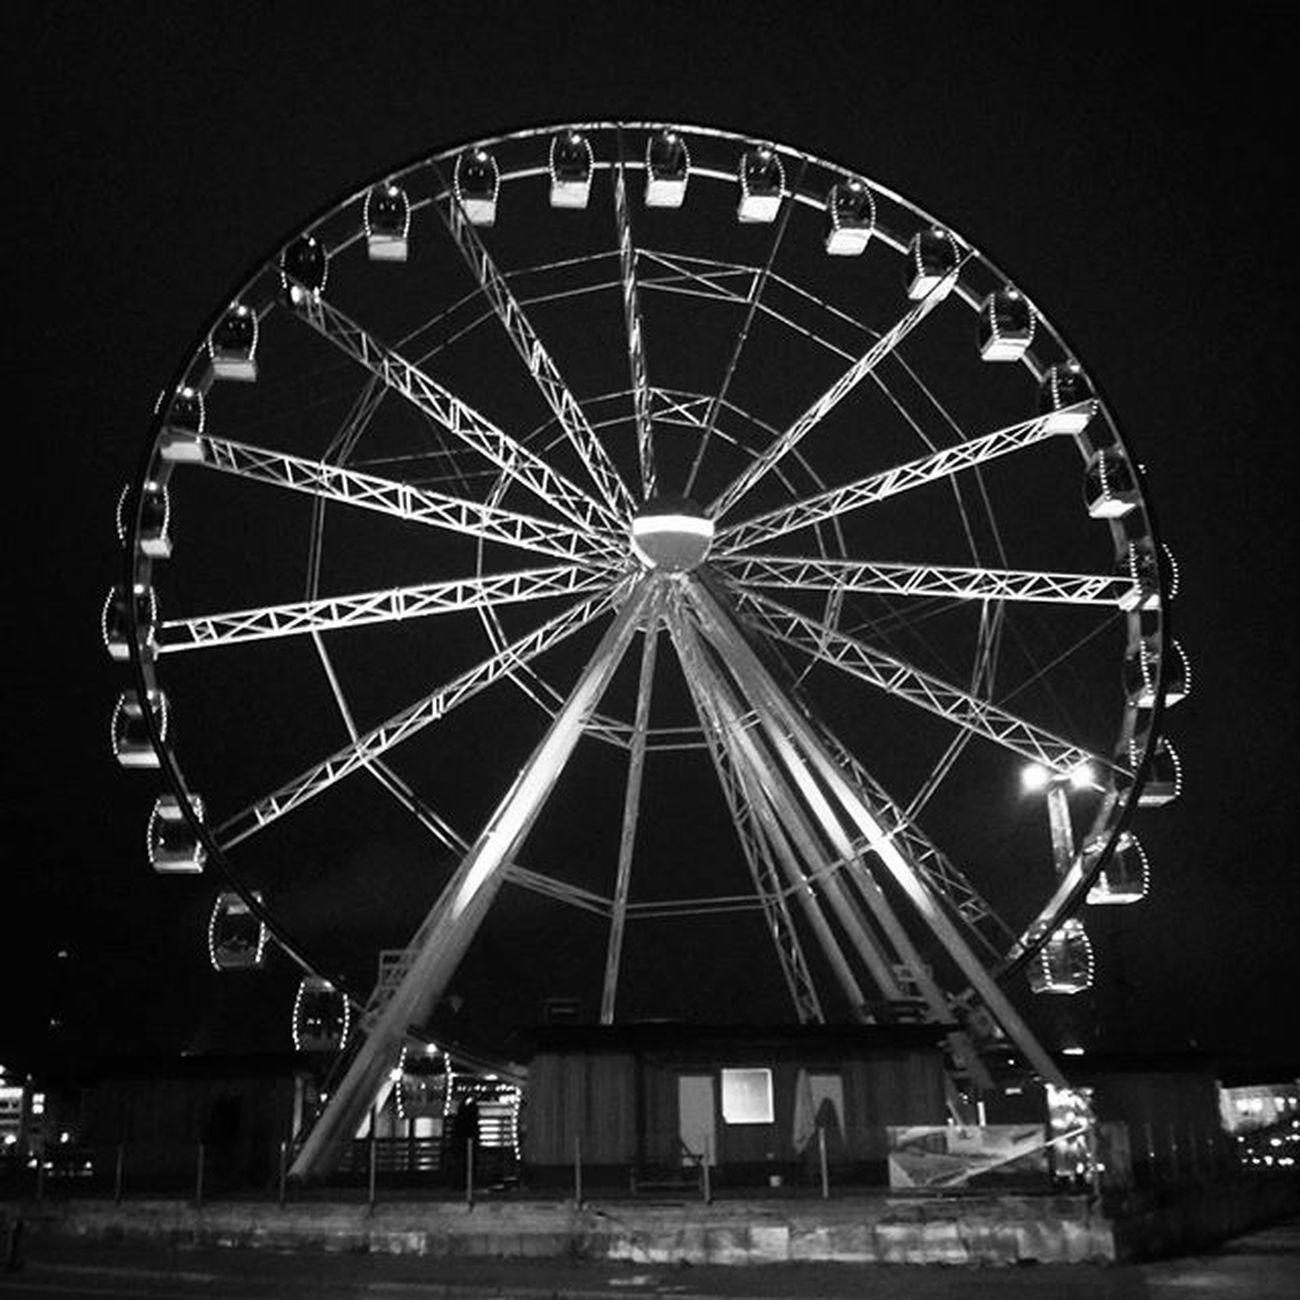 The Wheel Thisisfinland Helsinki Blackandwhite Monochrome Moodygrams Finland Suomi Helsinkiofficial Urban Ferriswheel